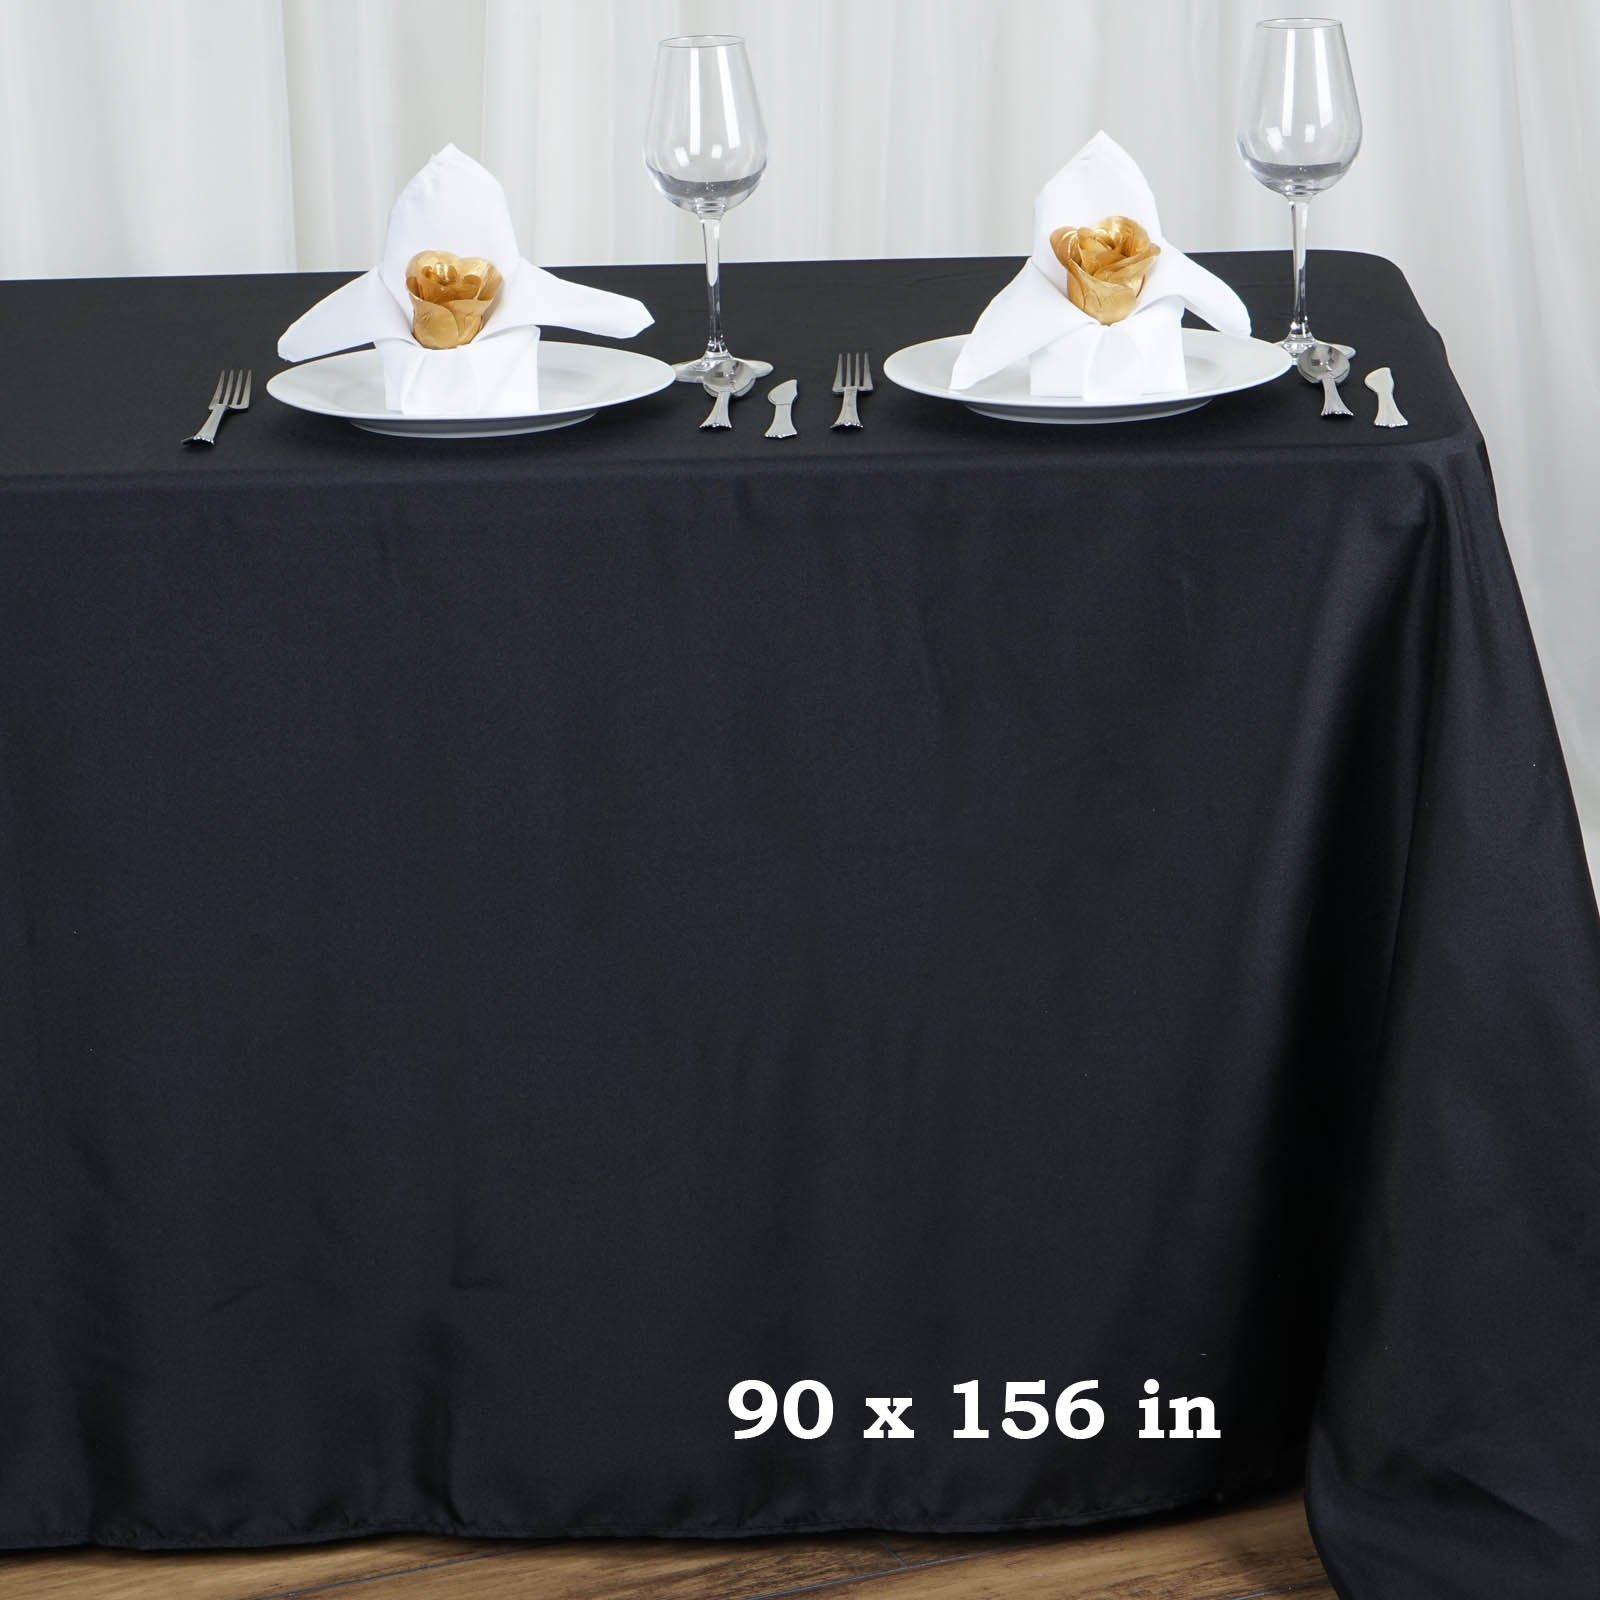 LinenTablecloth 90 x 156-Inch Rectangular Polyester Tablecloth Black